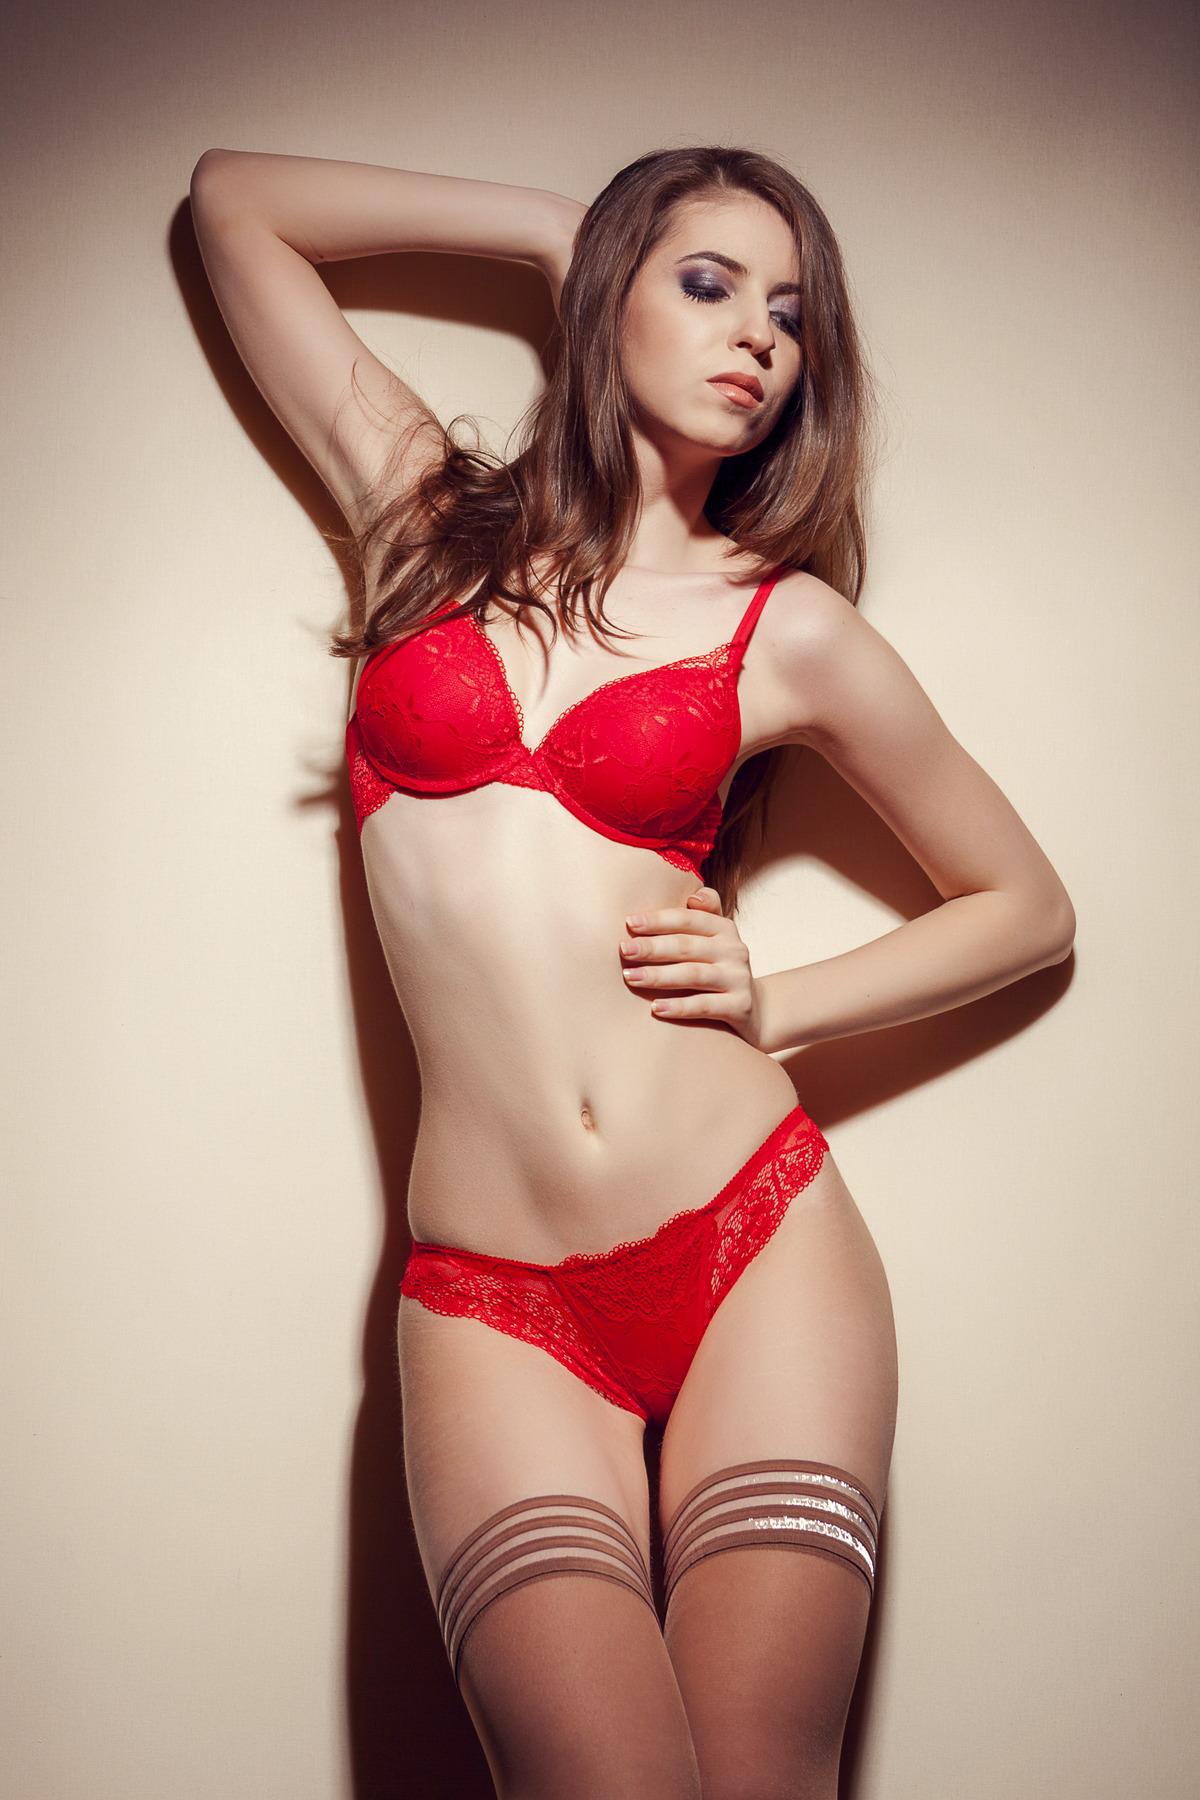 Selbstbewusstes Girl in roter Unterwäsche